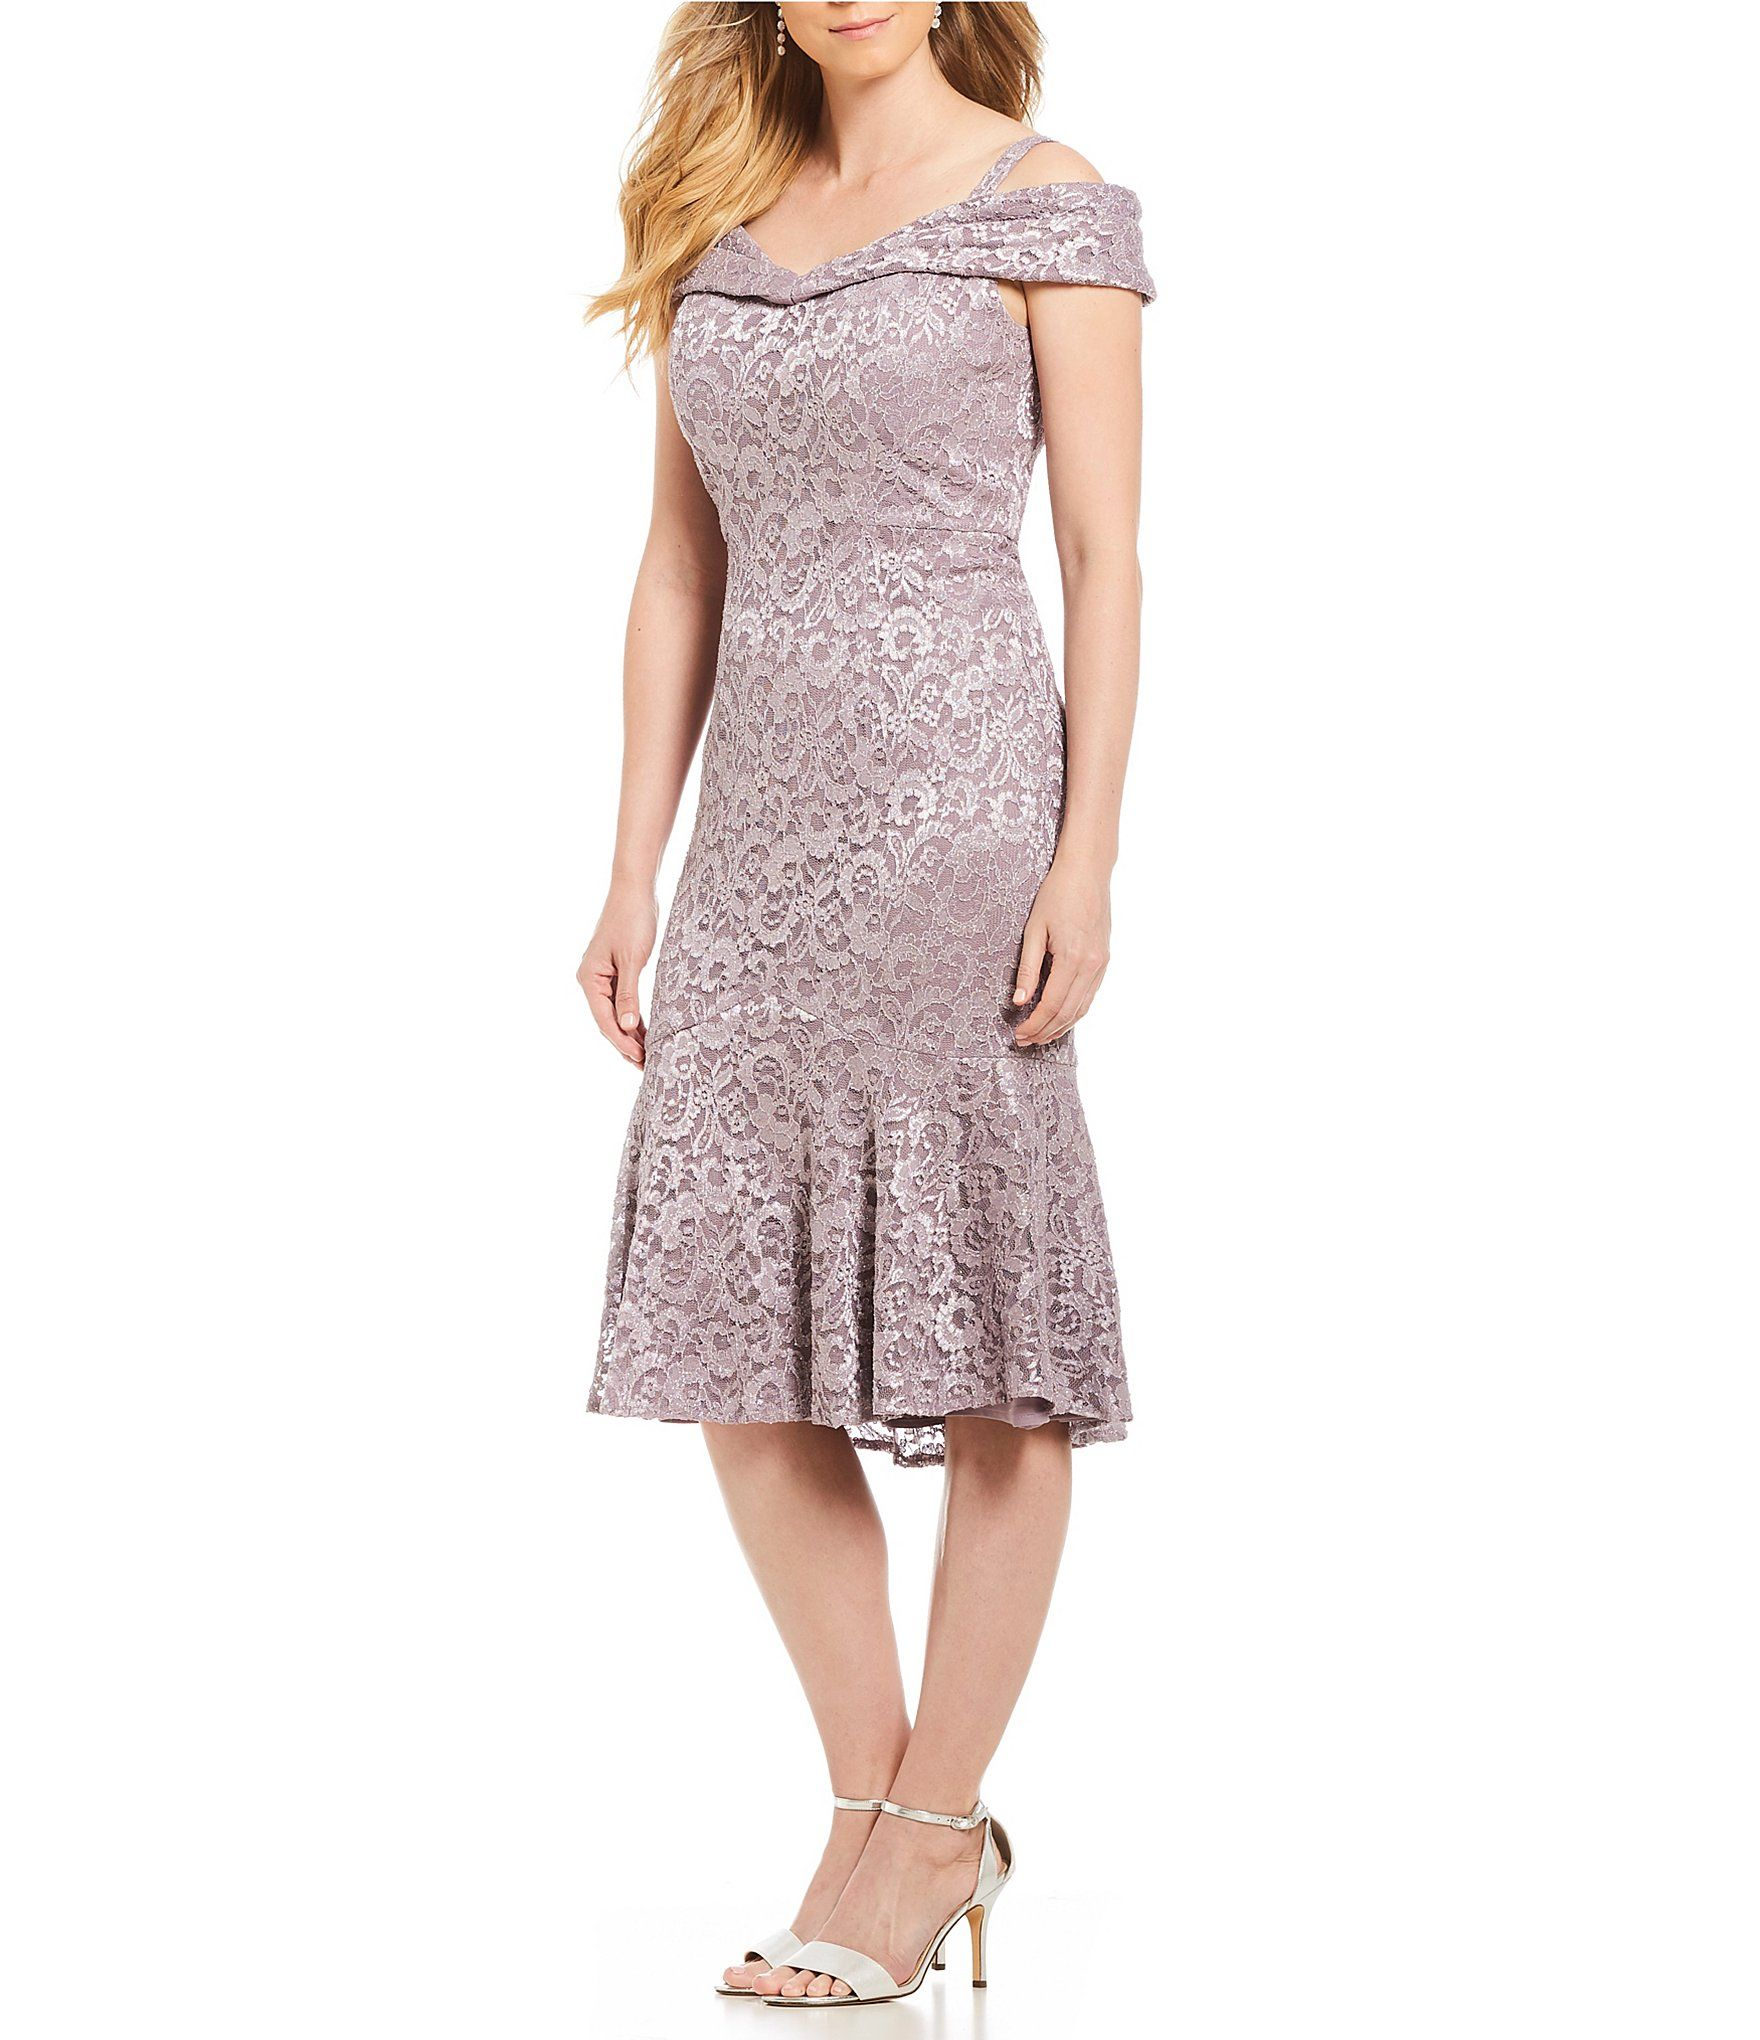 e69d4dfc3d7 Shop for R   M Richards Off-The-Shoulder Sweetheart Lace Dress at  Dillards.com. Visit Dillards.com to find clothing